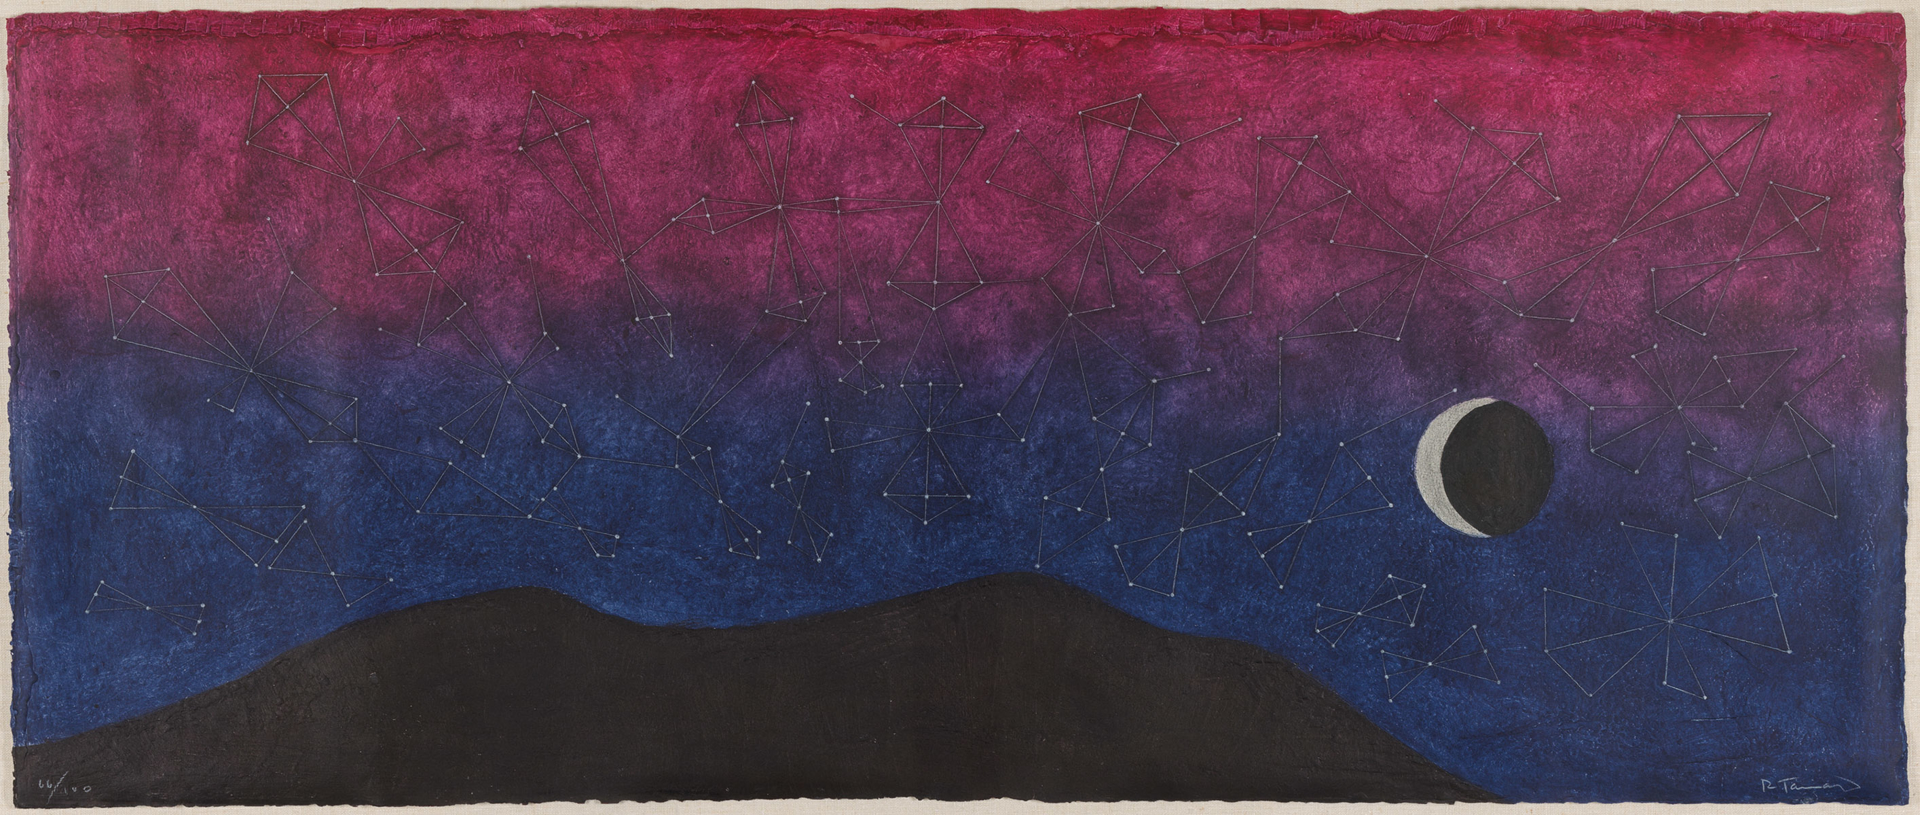 Galaxia by Rufino Tamayo (1899 - 1991)